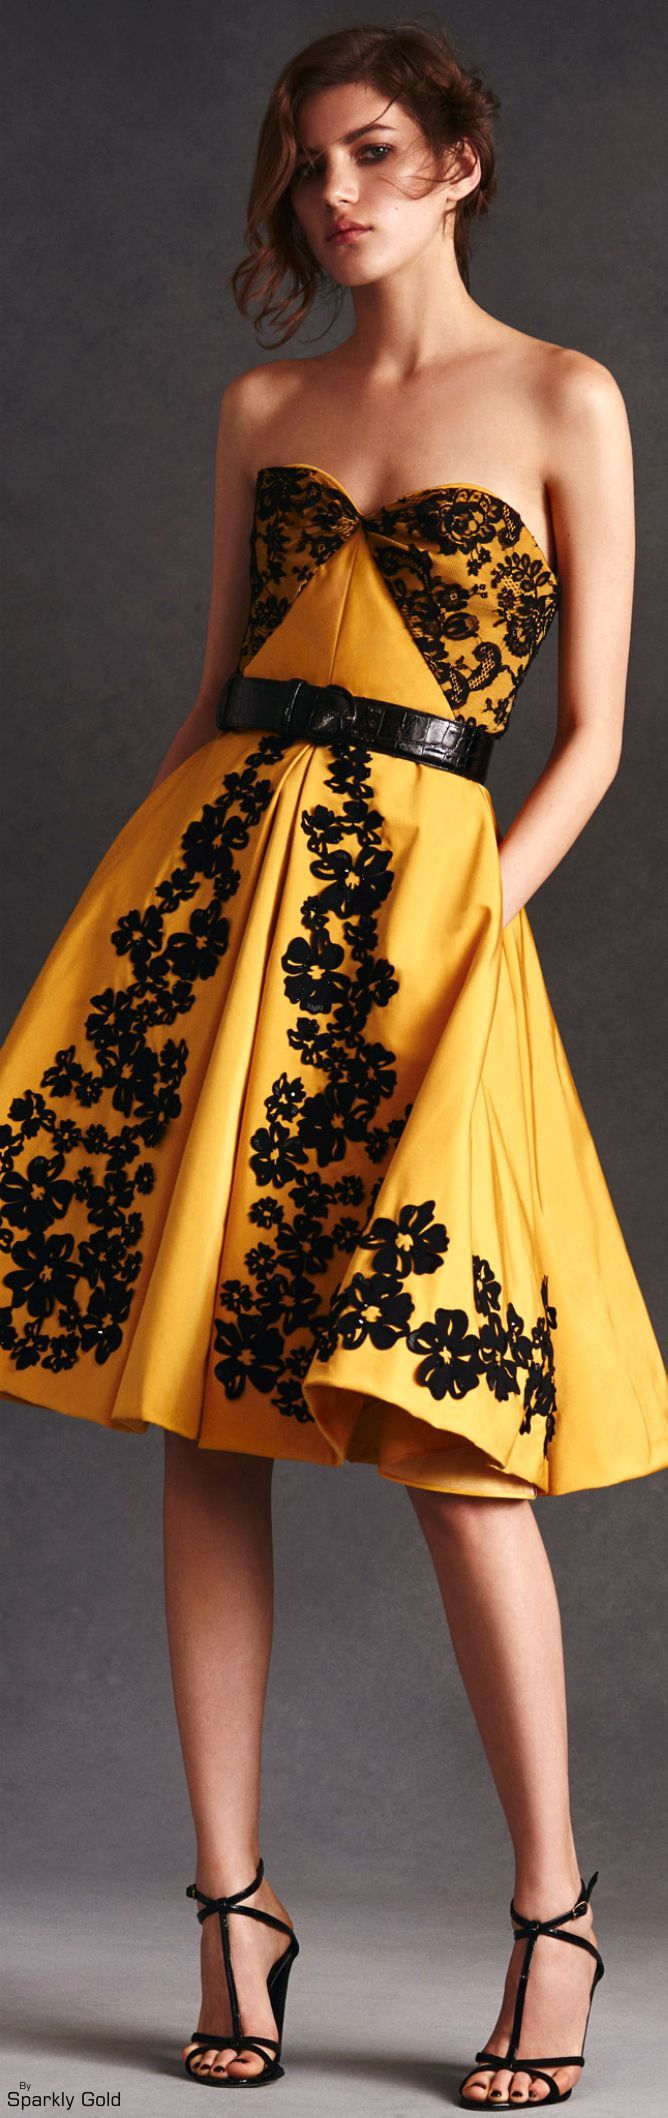 Oscar de la Renta Resort 2016. Yellow dress. women fashion outfit clothing style apparel @roressclothes closet ideas